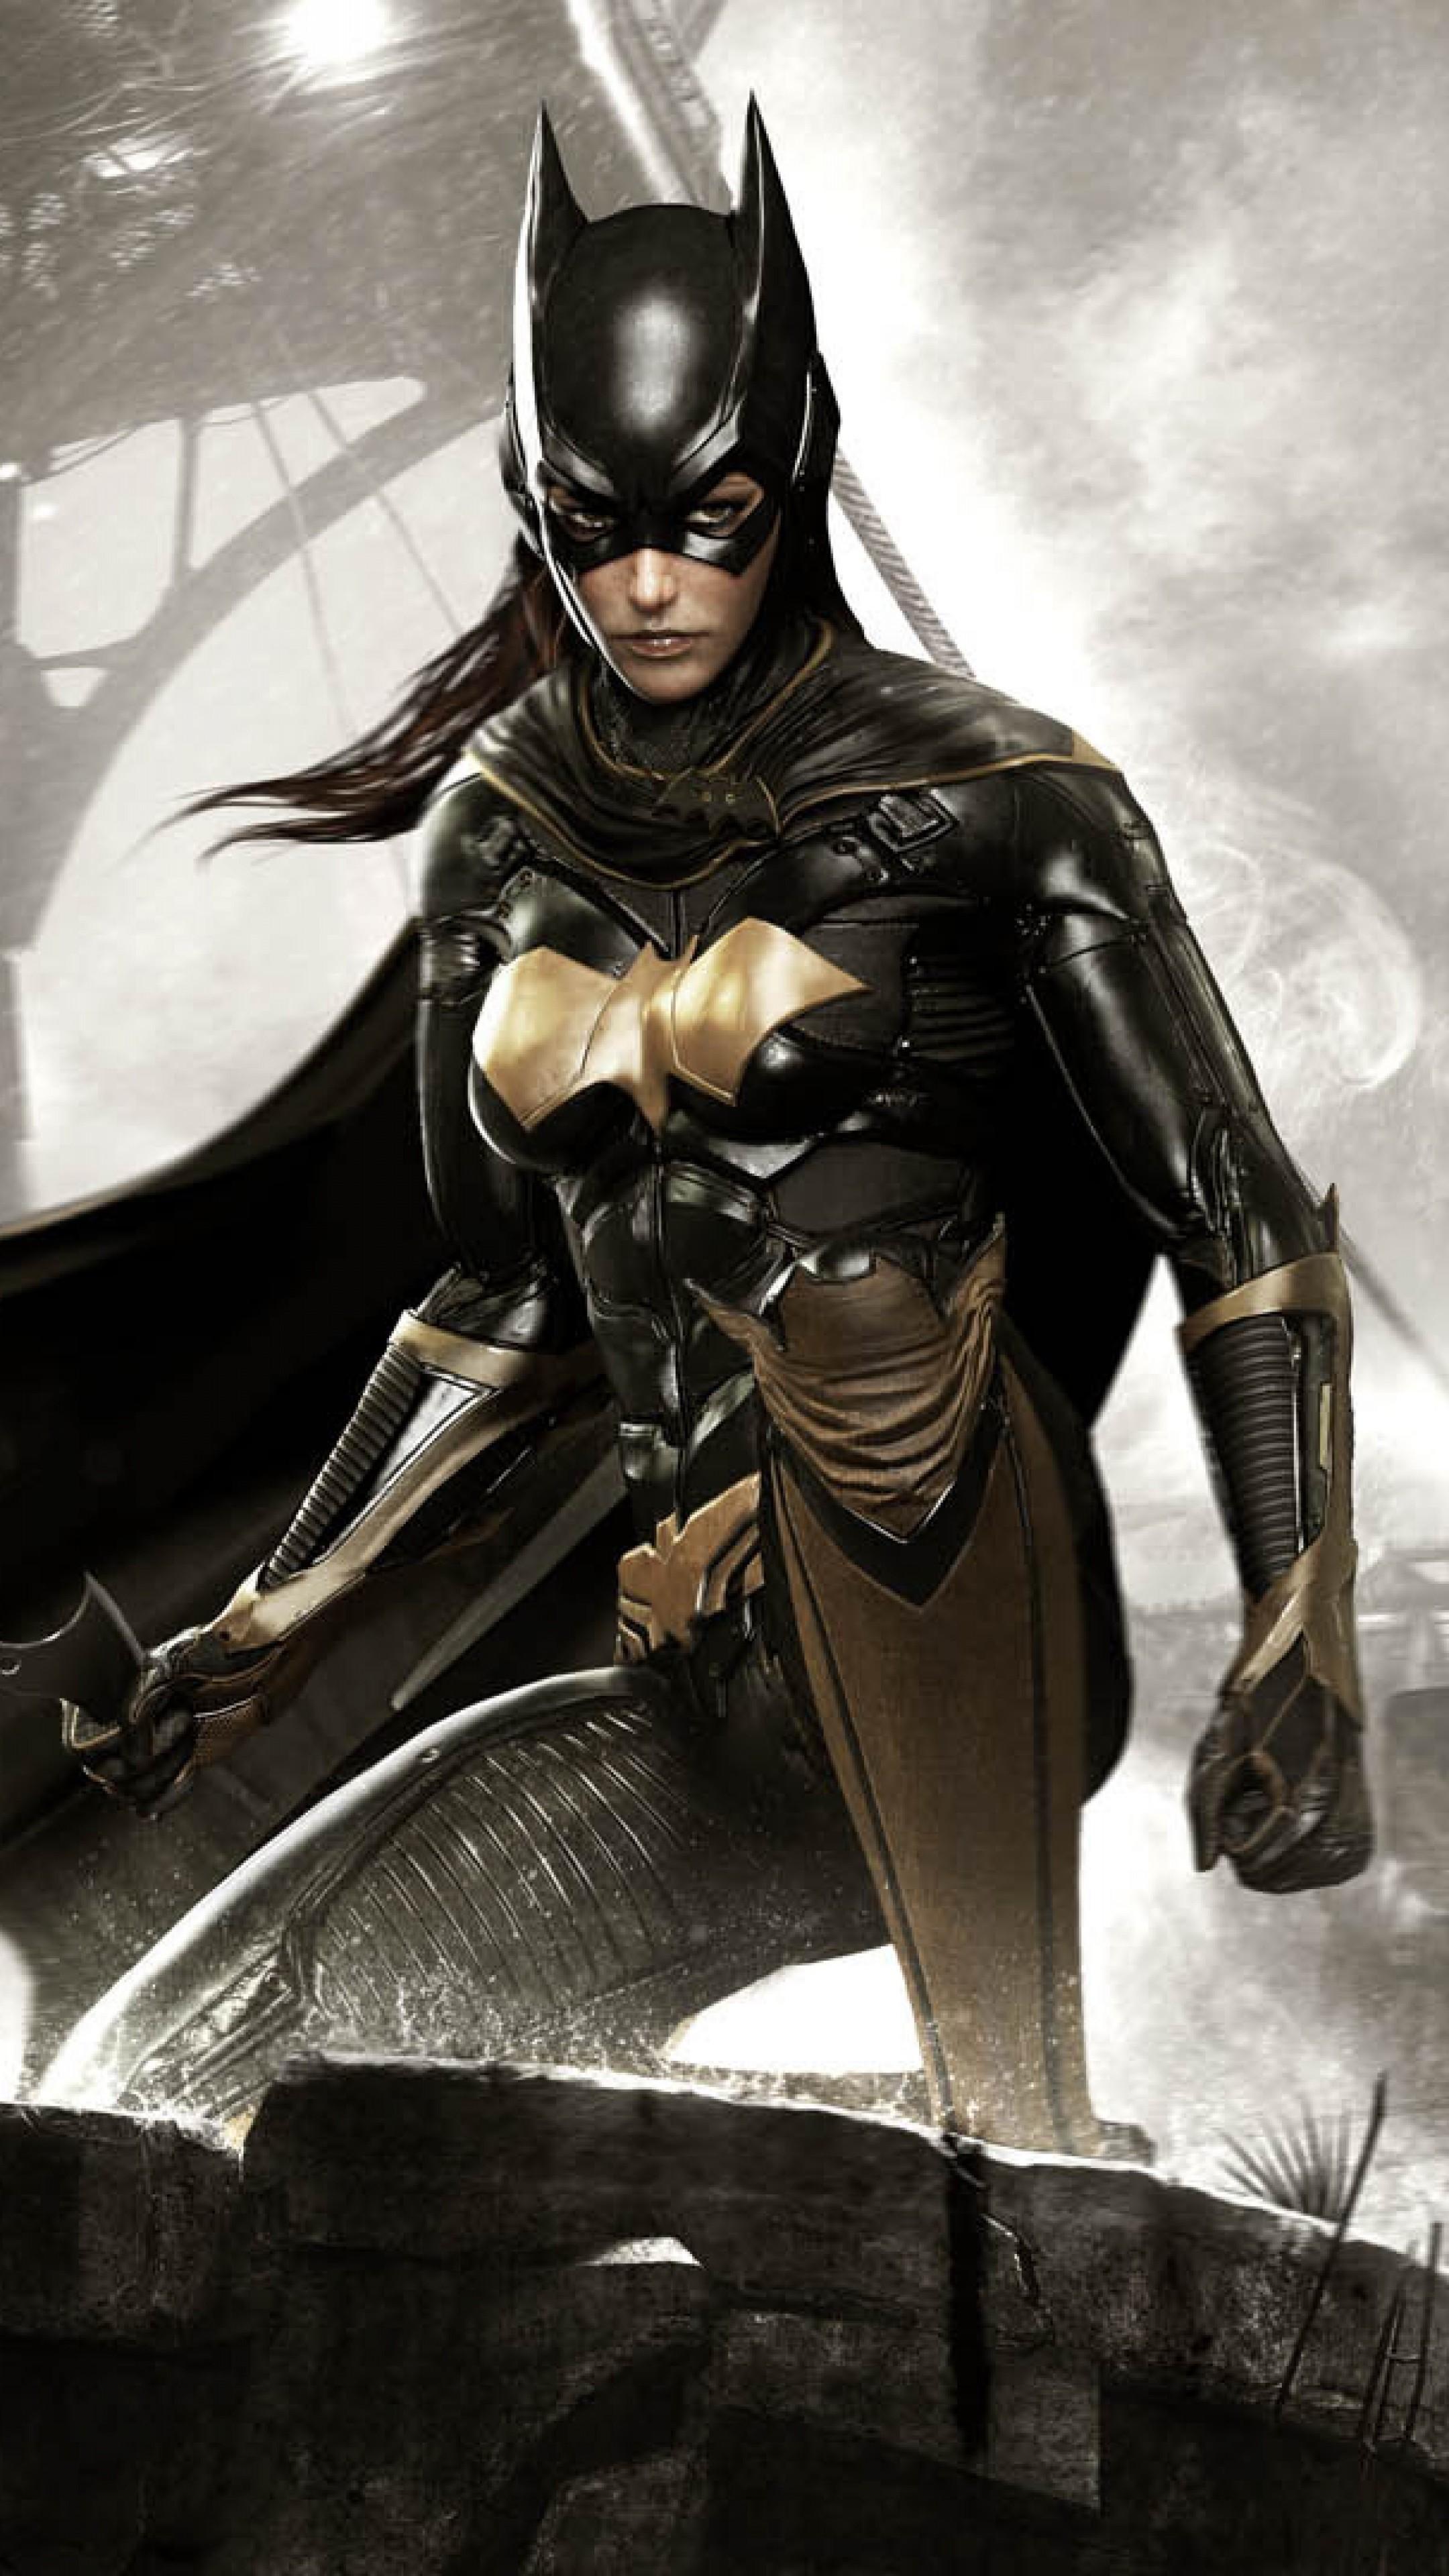 Wallpaper batman, arkham knight, batgirl